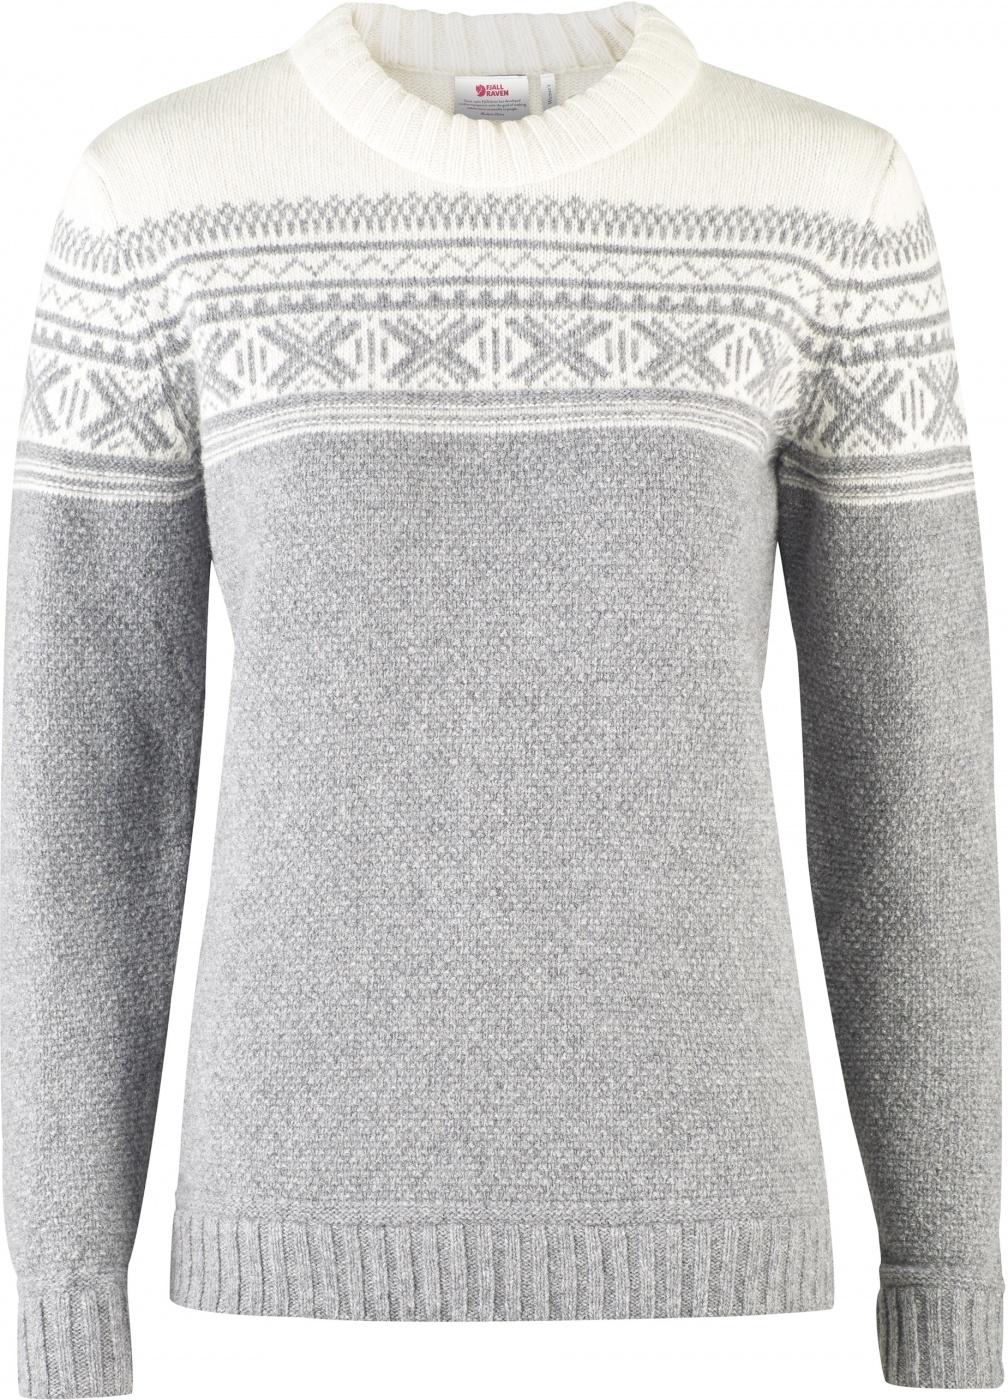 FjallRaven Övik Scandinavian Sweater W Grey-30